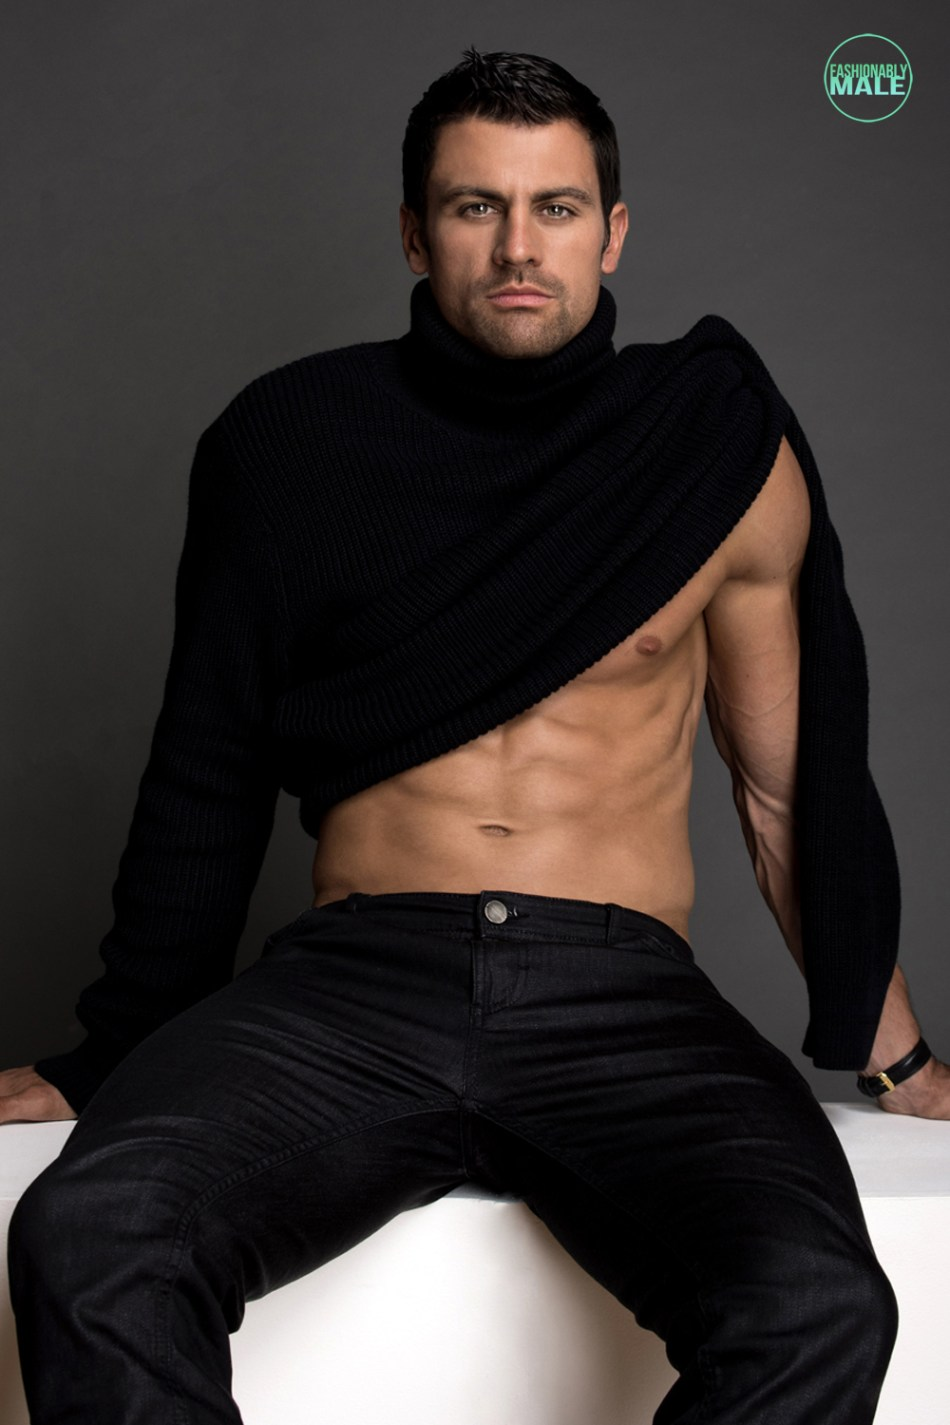 Michael J Scanlon for FashionablyMale (6)